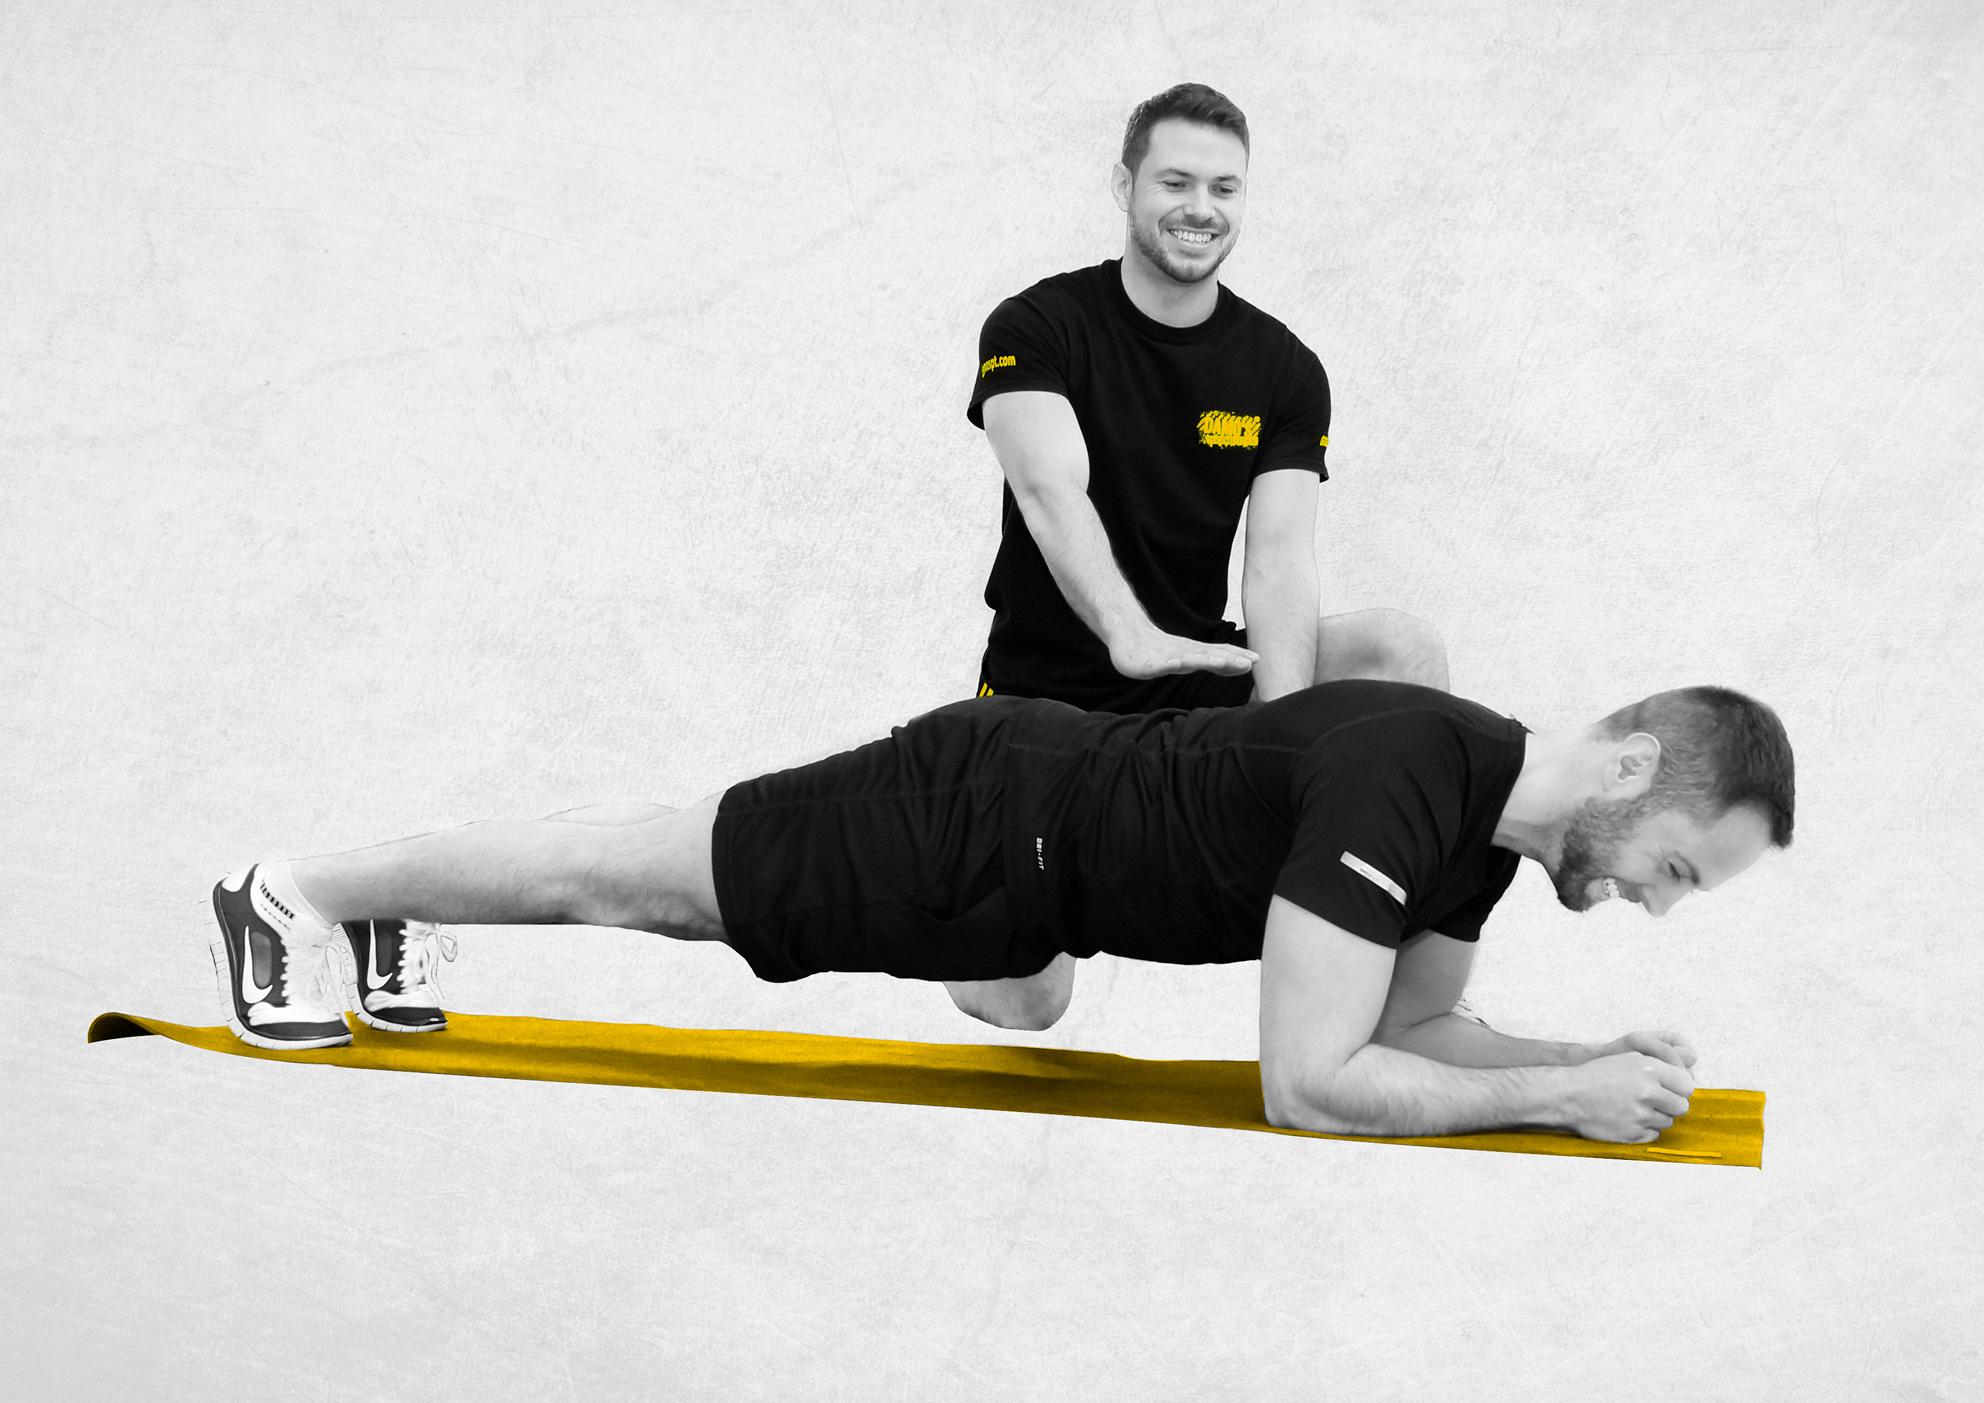 Paul Plank